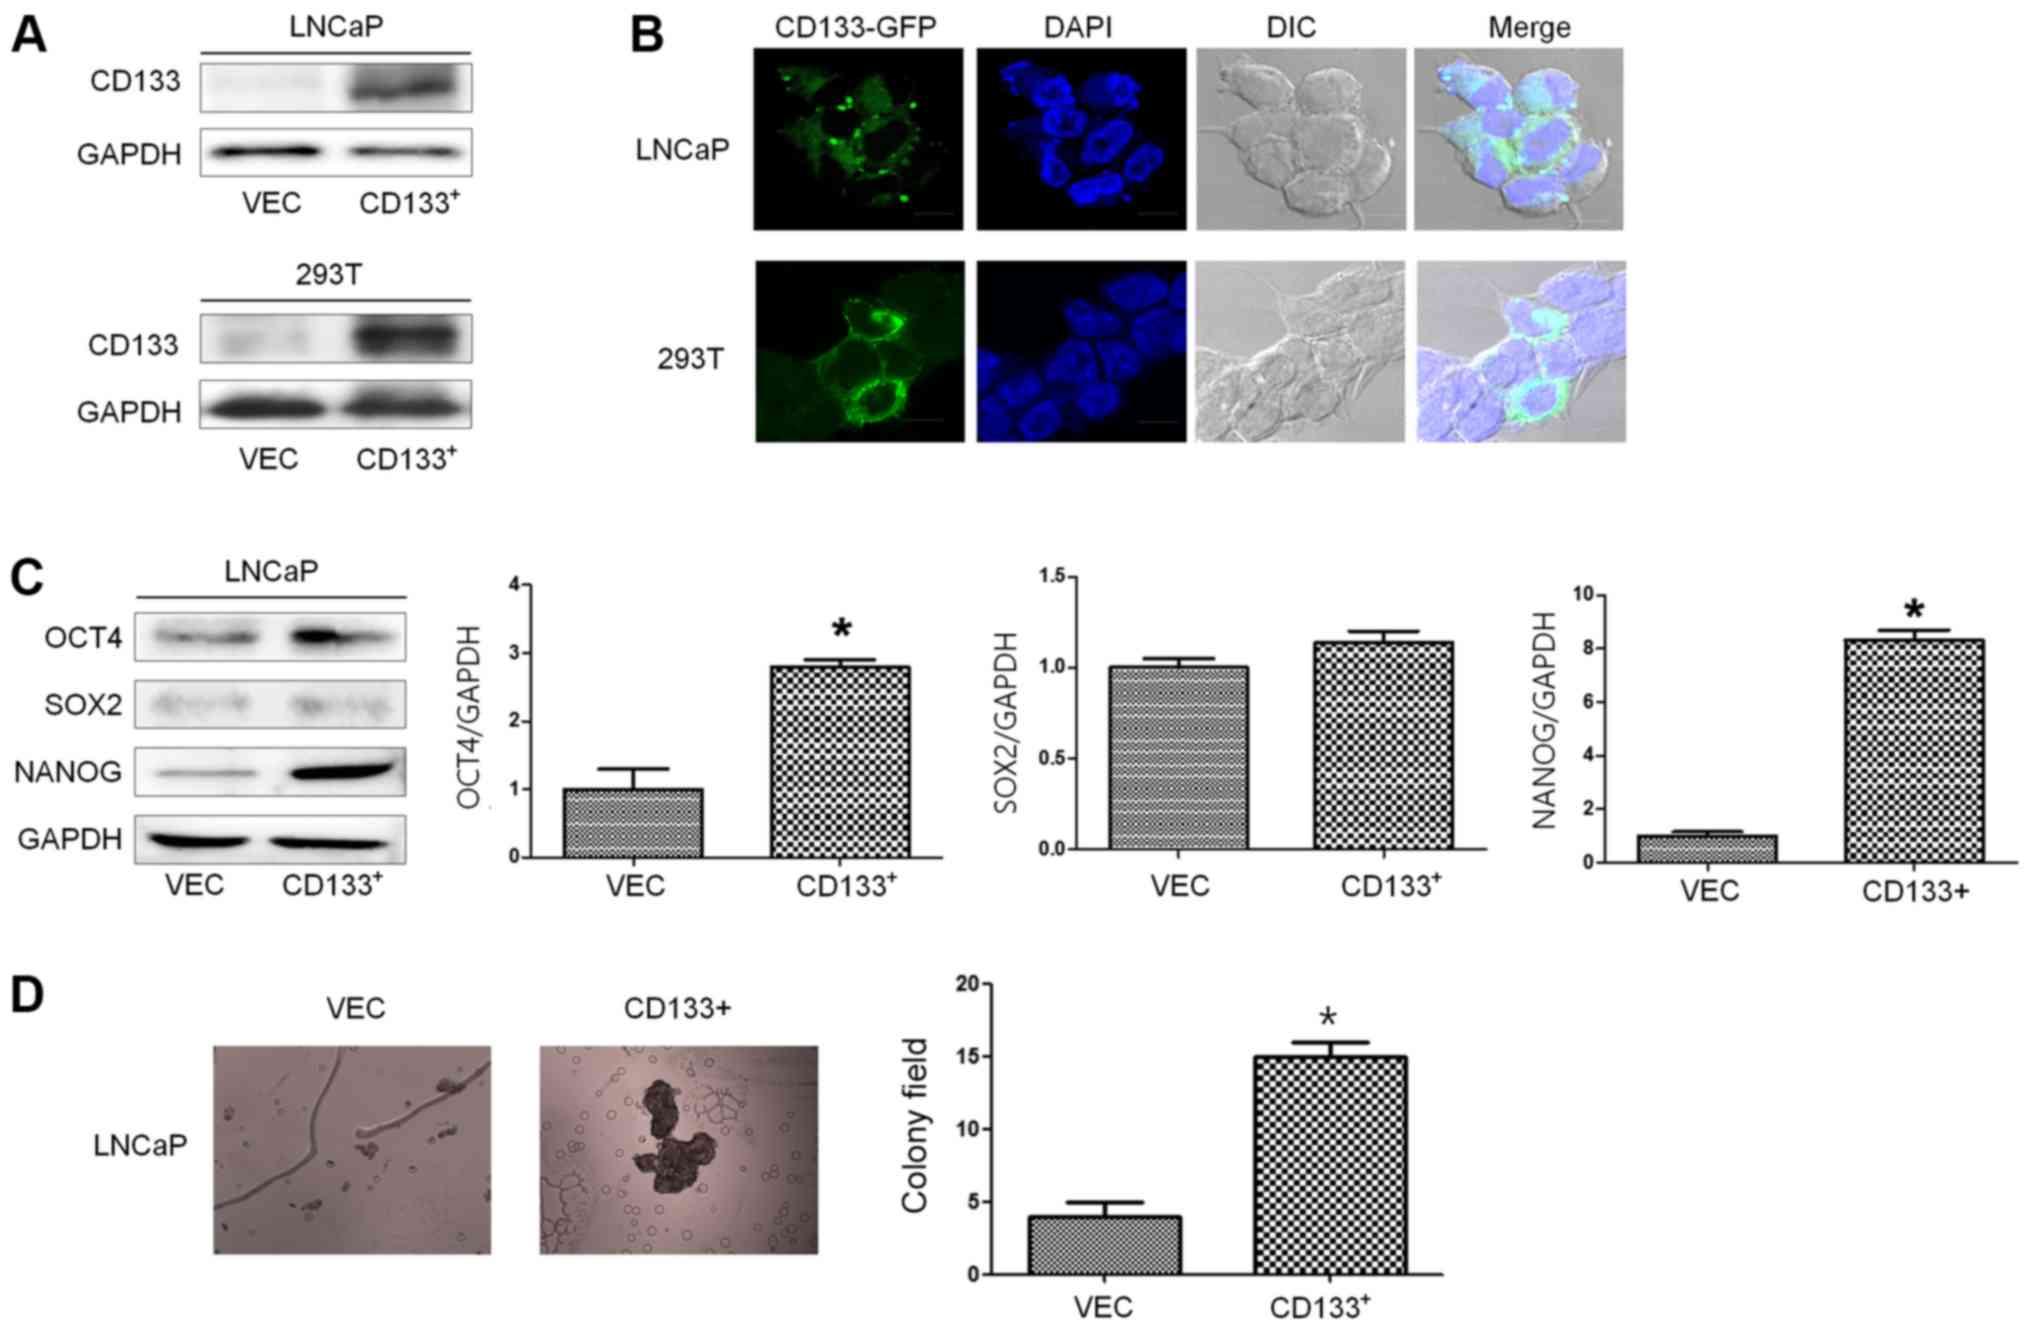 Effect of CD133 overexpression on bone metastasis in